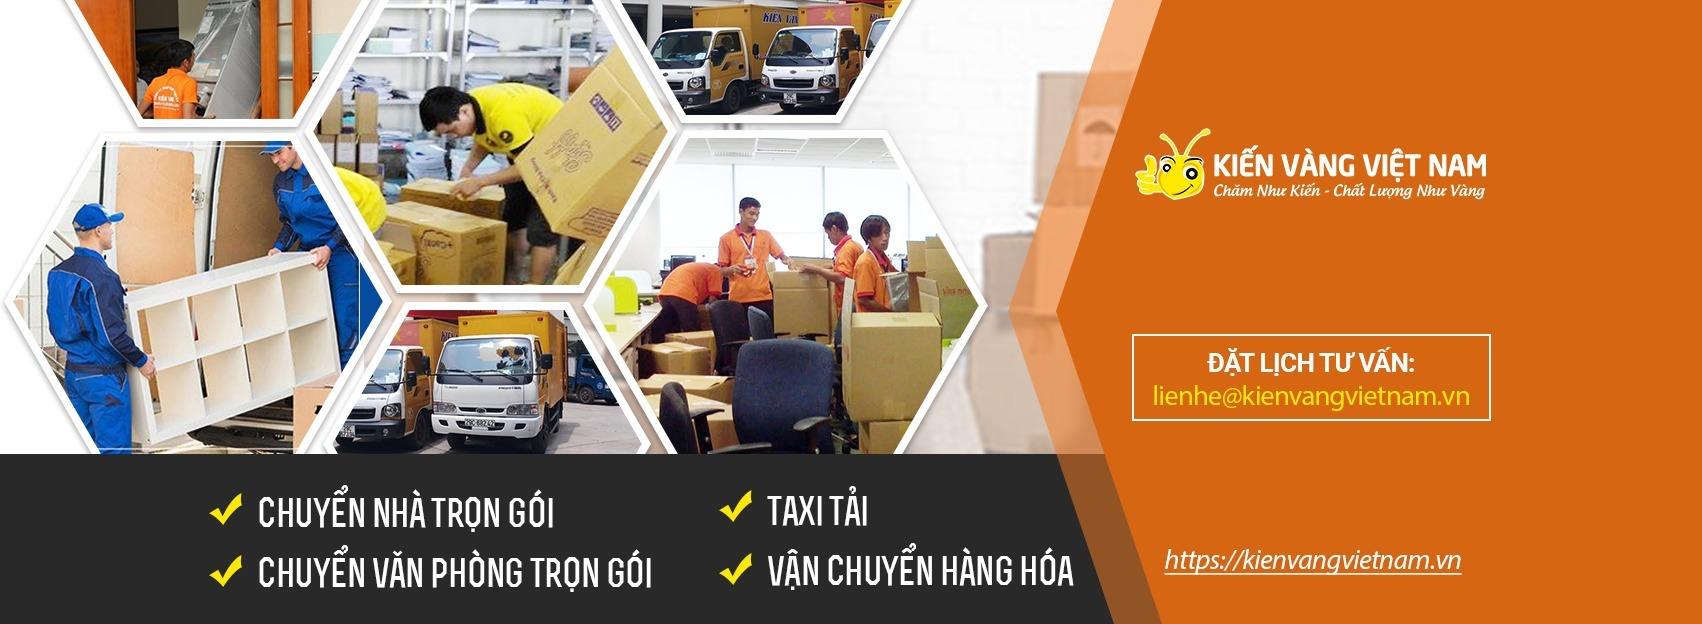 Kiến vàng Việt Nam (@kienvangvietnam) Cover Image